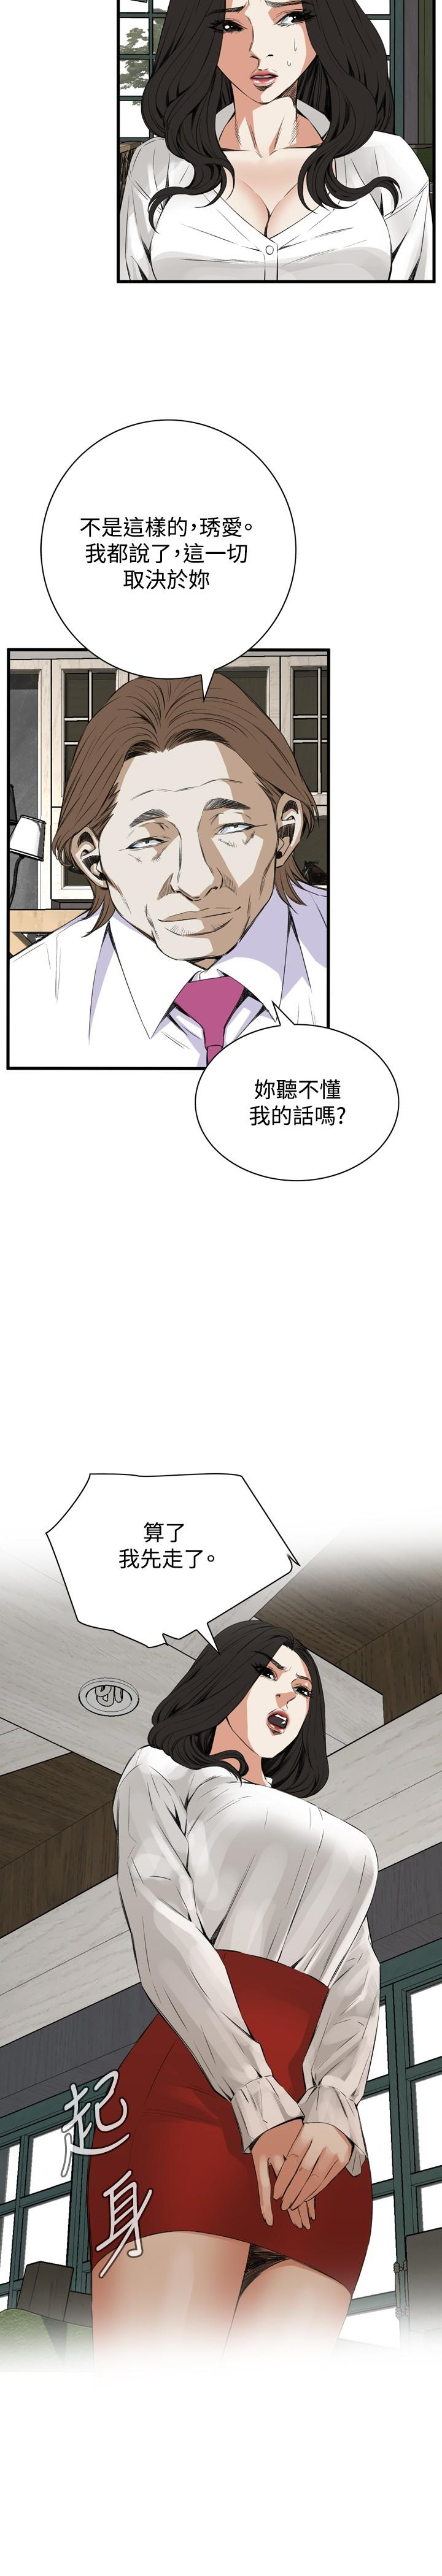 Take a Peek 偷窥 Ch.39~51 [Chinese]中文 277